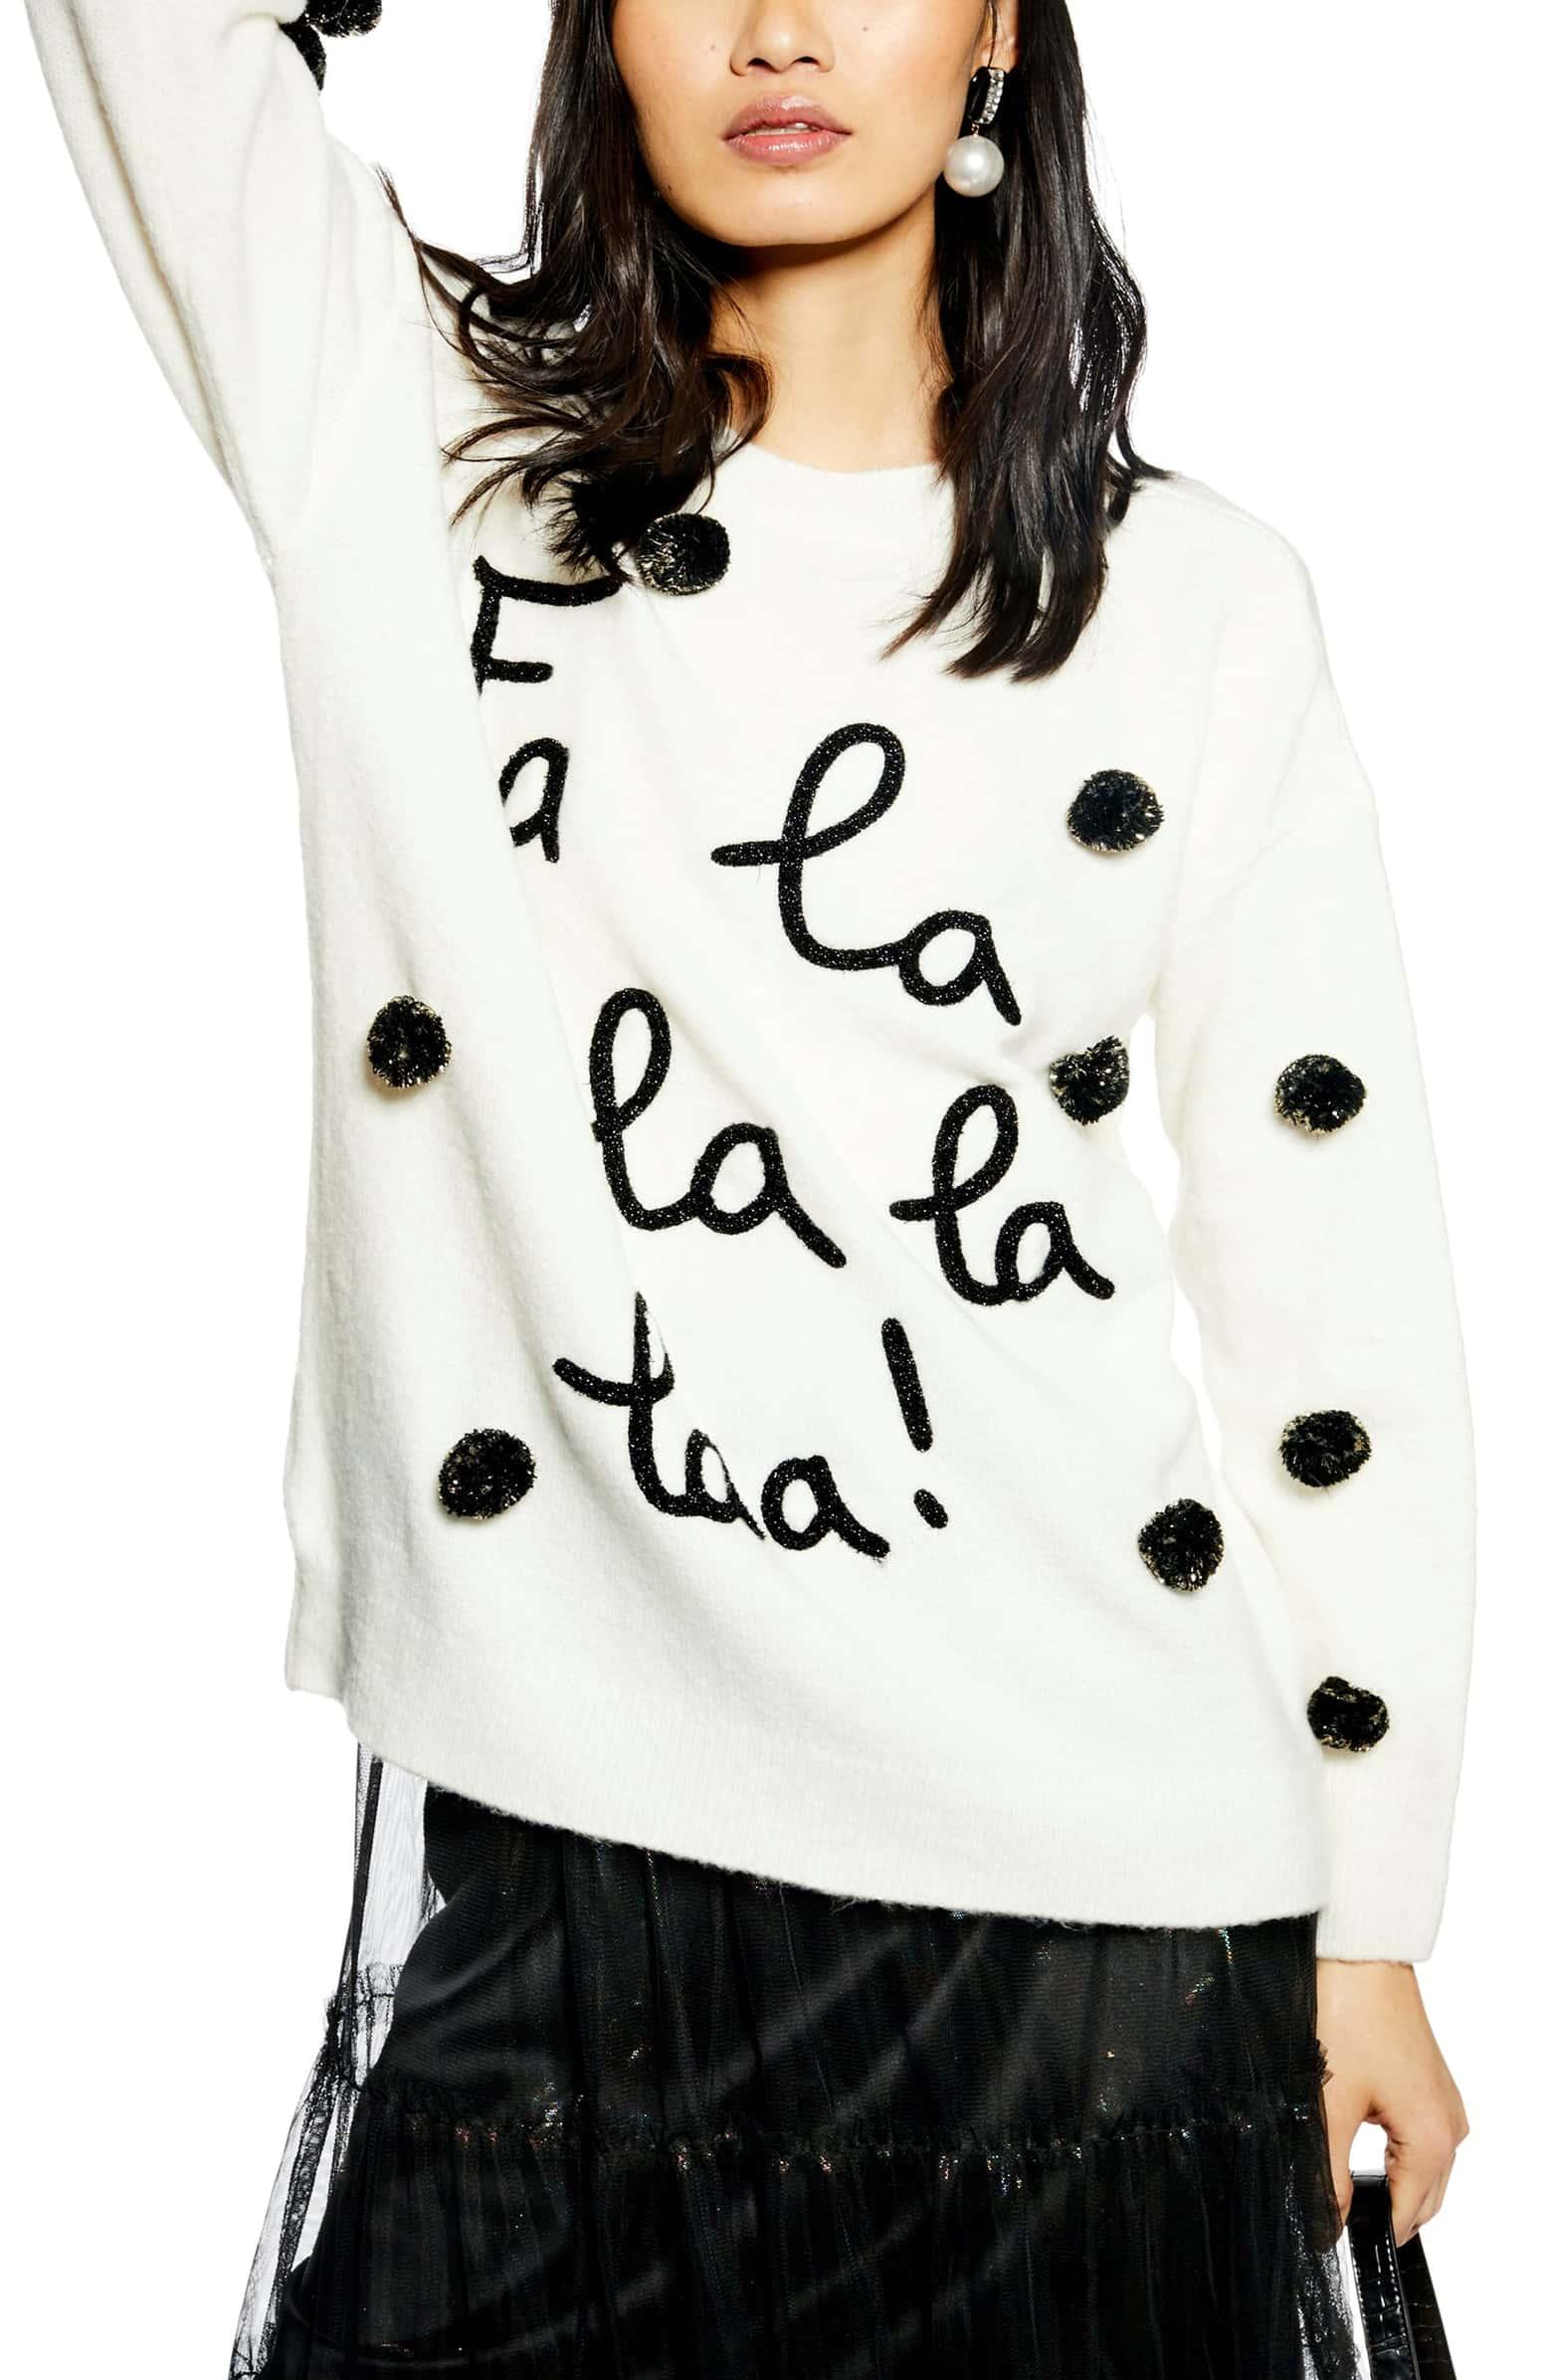 Women's Christmas Sweaters - fa la la laa